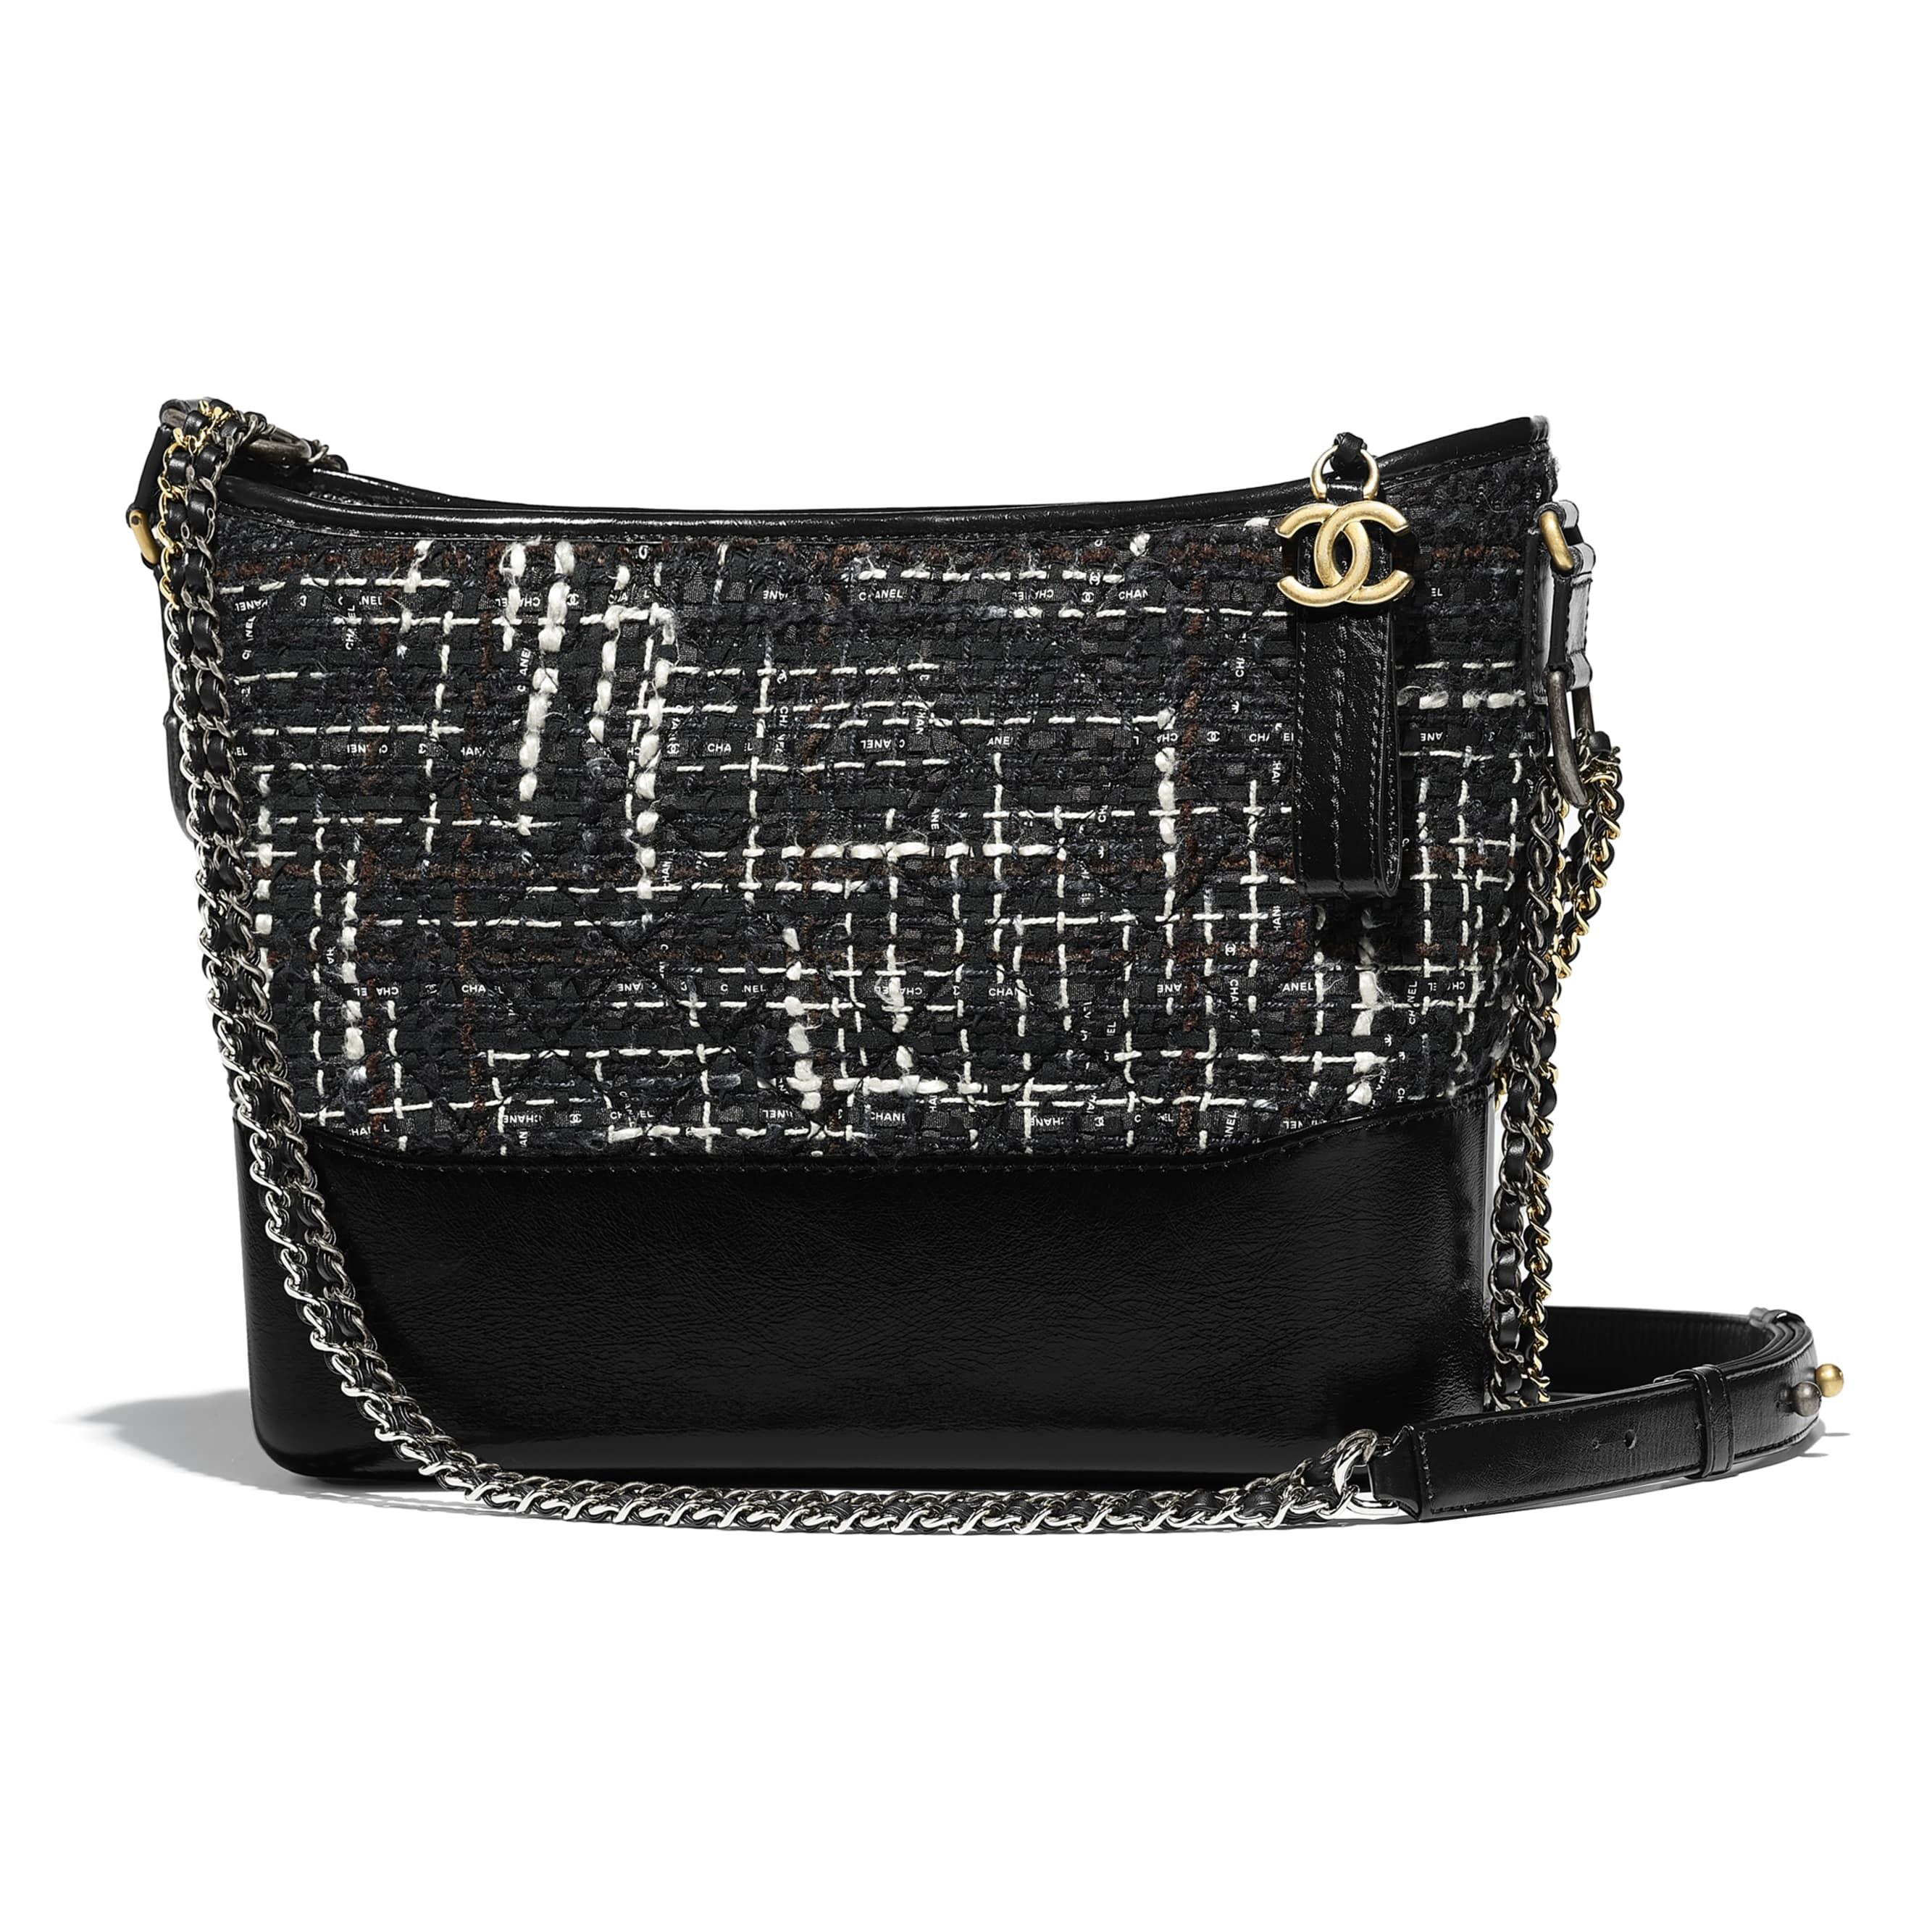 Chanel Gabrielle Hobo Bag Tweed Silver/Gold-tone Black Multicolor